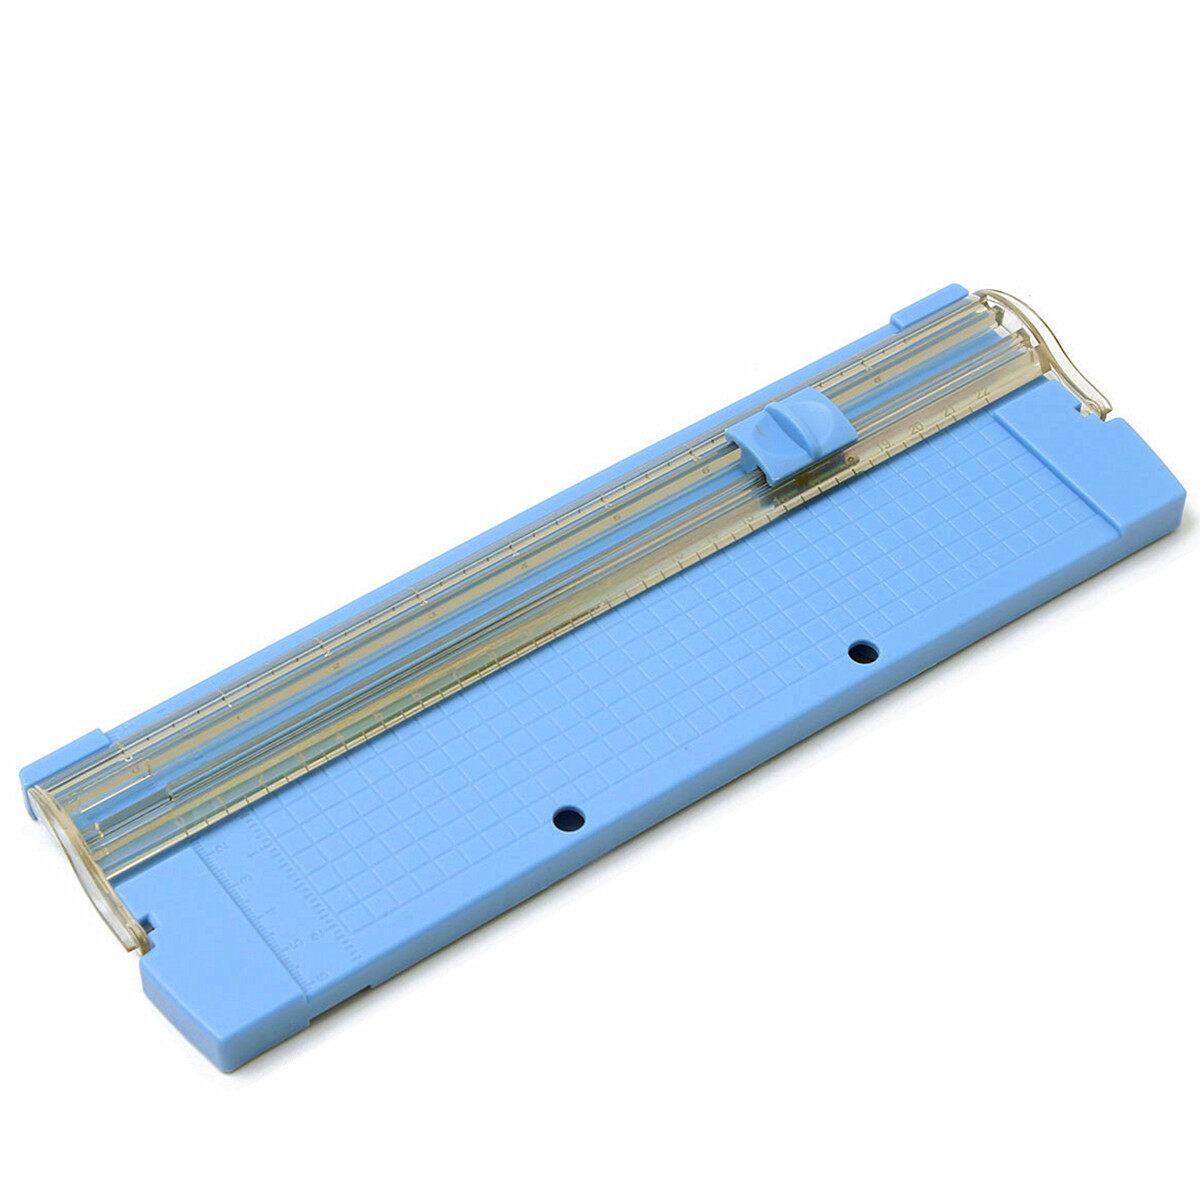 Nên mua Channy A4/A5 Precision Paper Card Art Trimmer Photo Cutter Cutting Mat Blade Ruler UK NEW – intl ở Channy